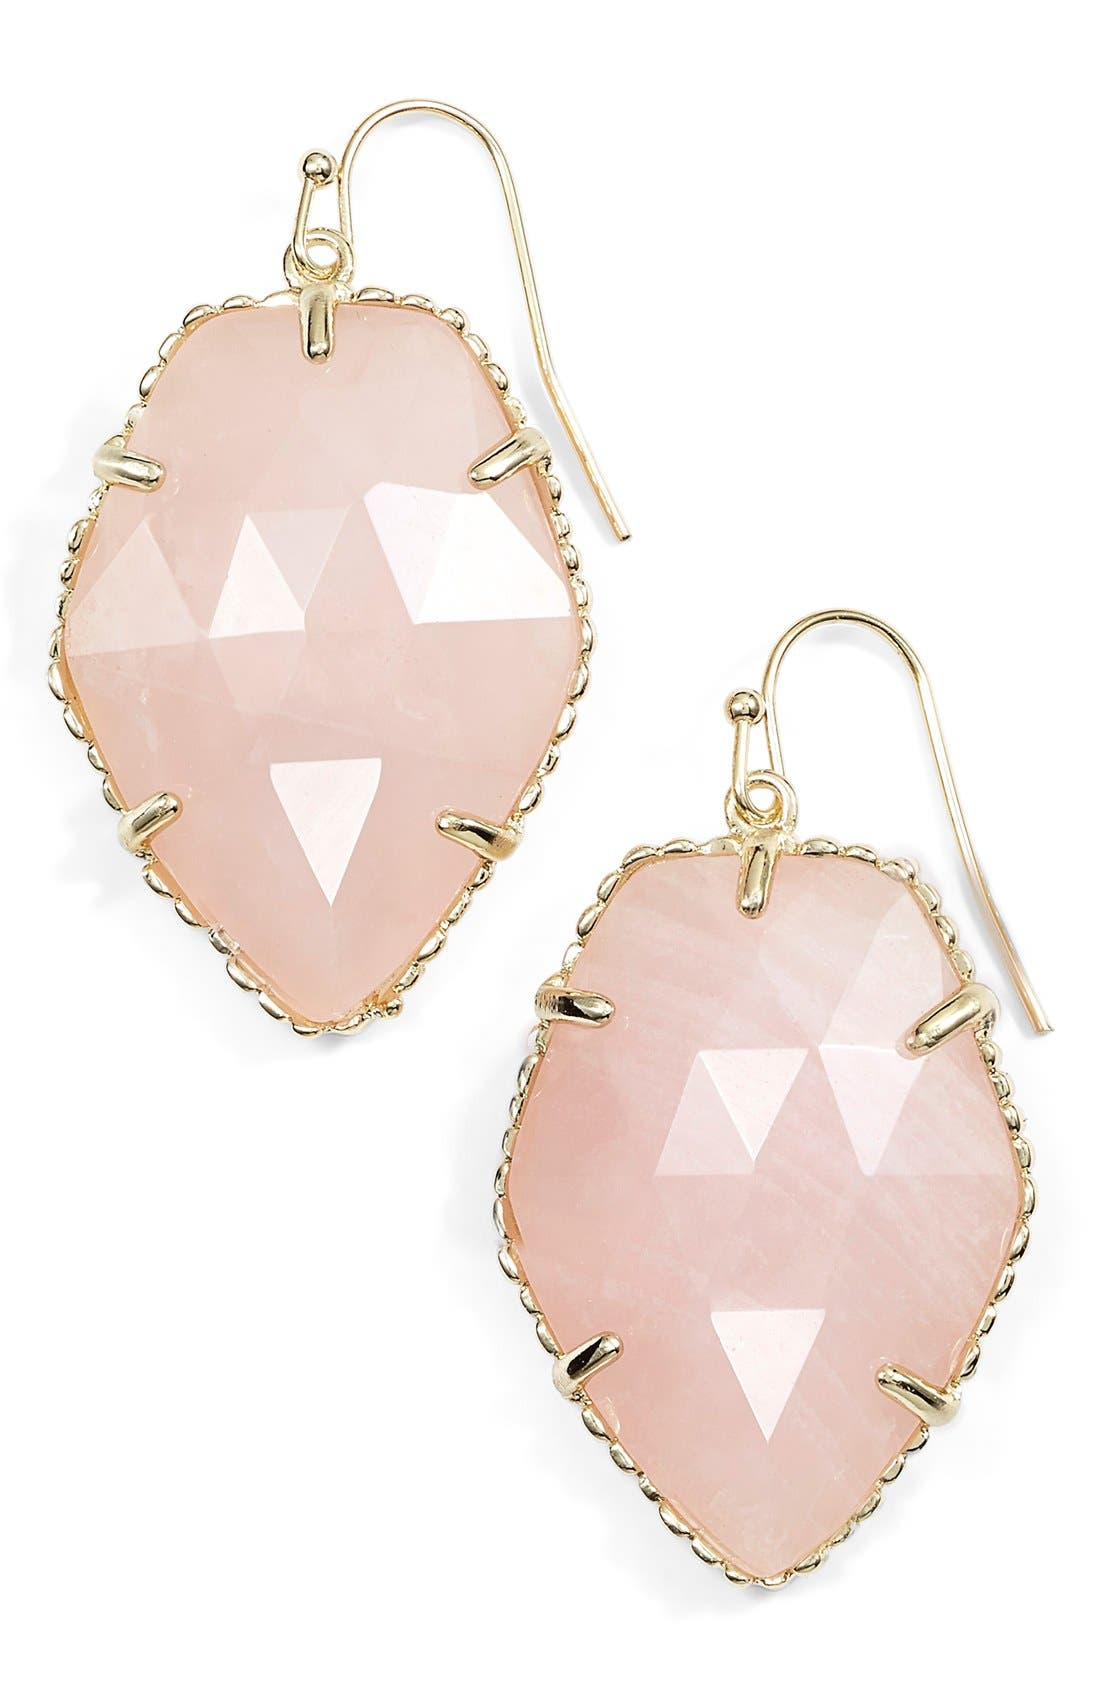 Alternate Image 1 Selected - Kendra Scott 'Corley' Faceted Stone Drop Earrings